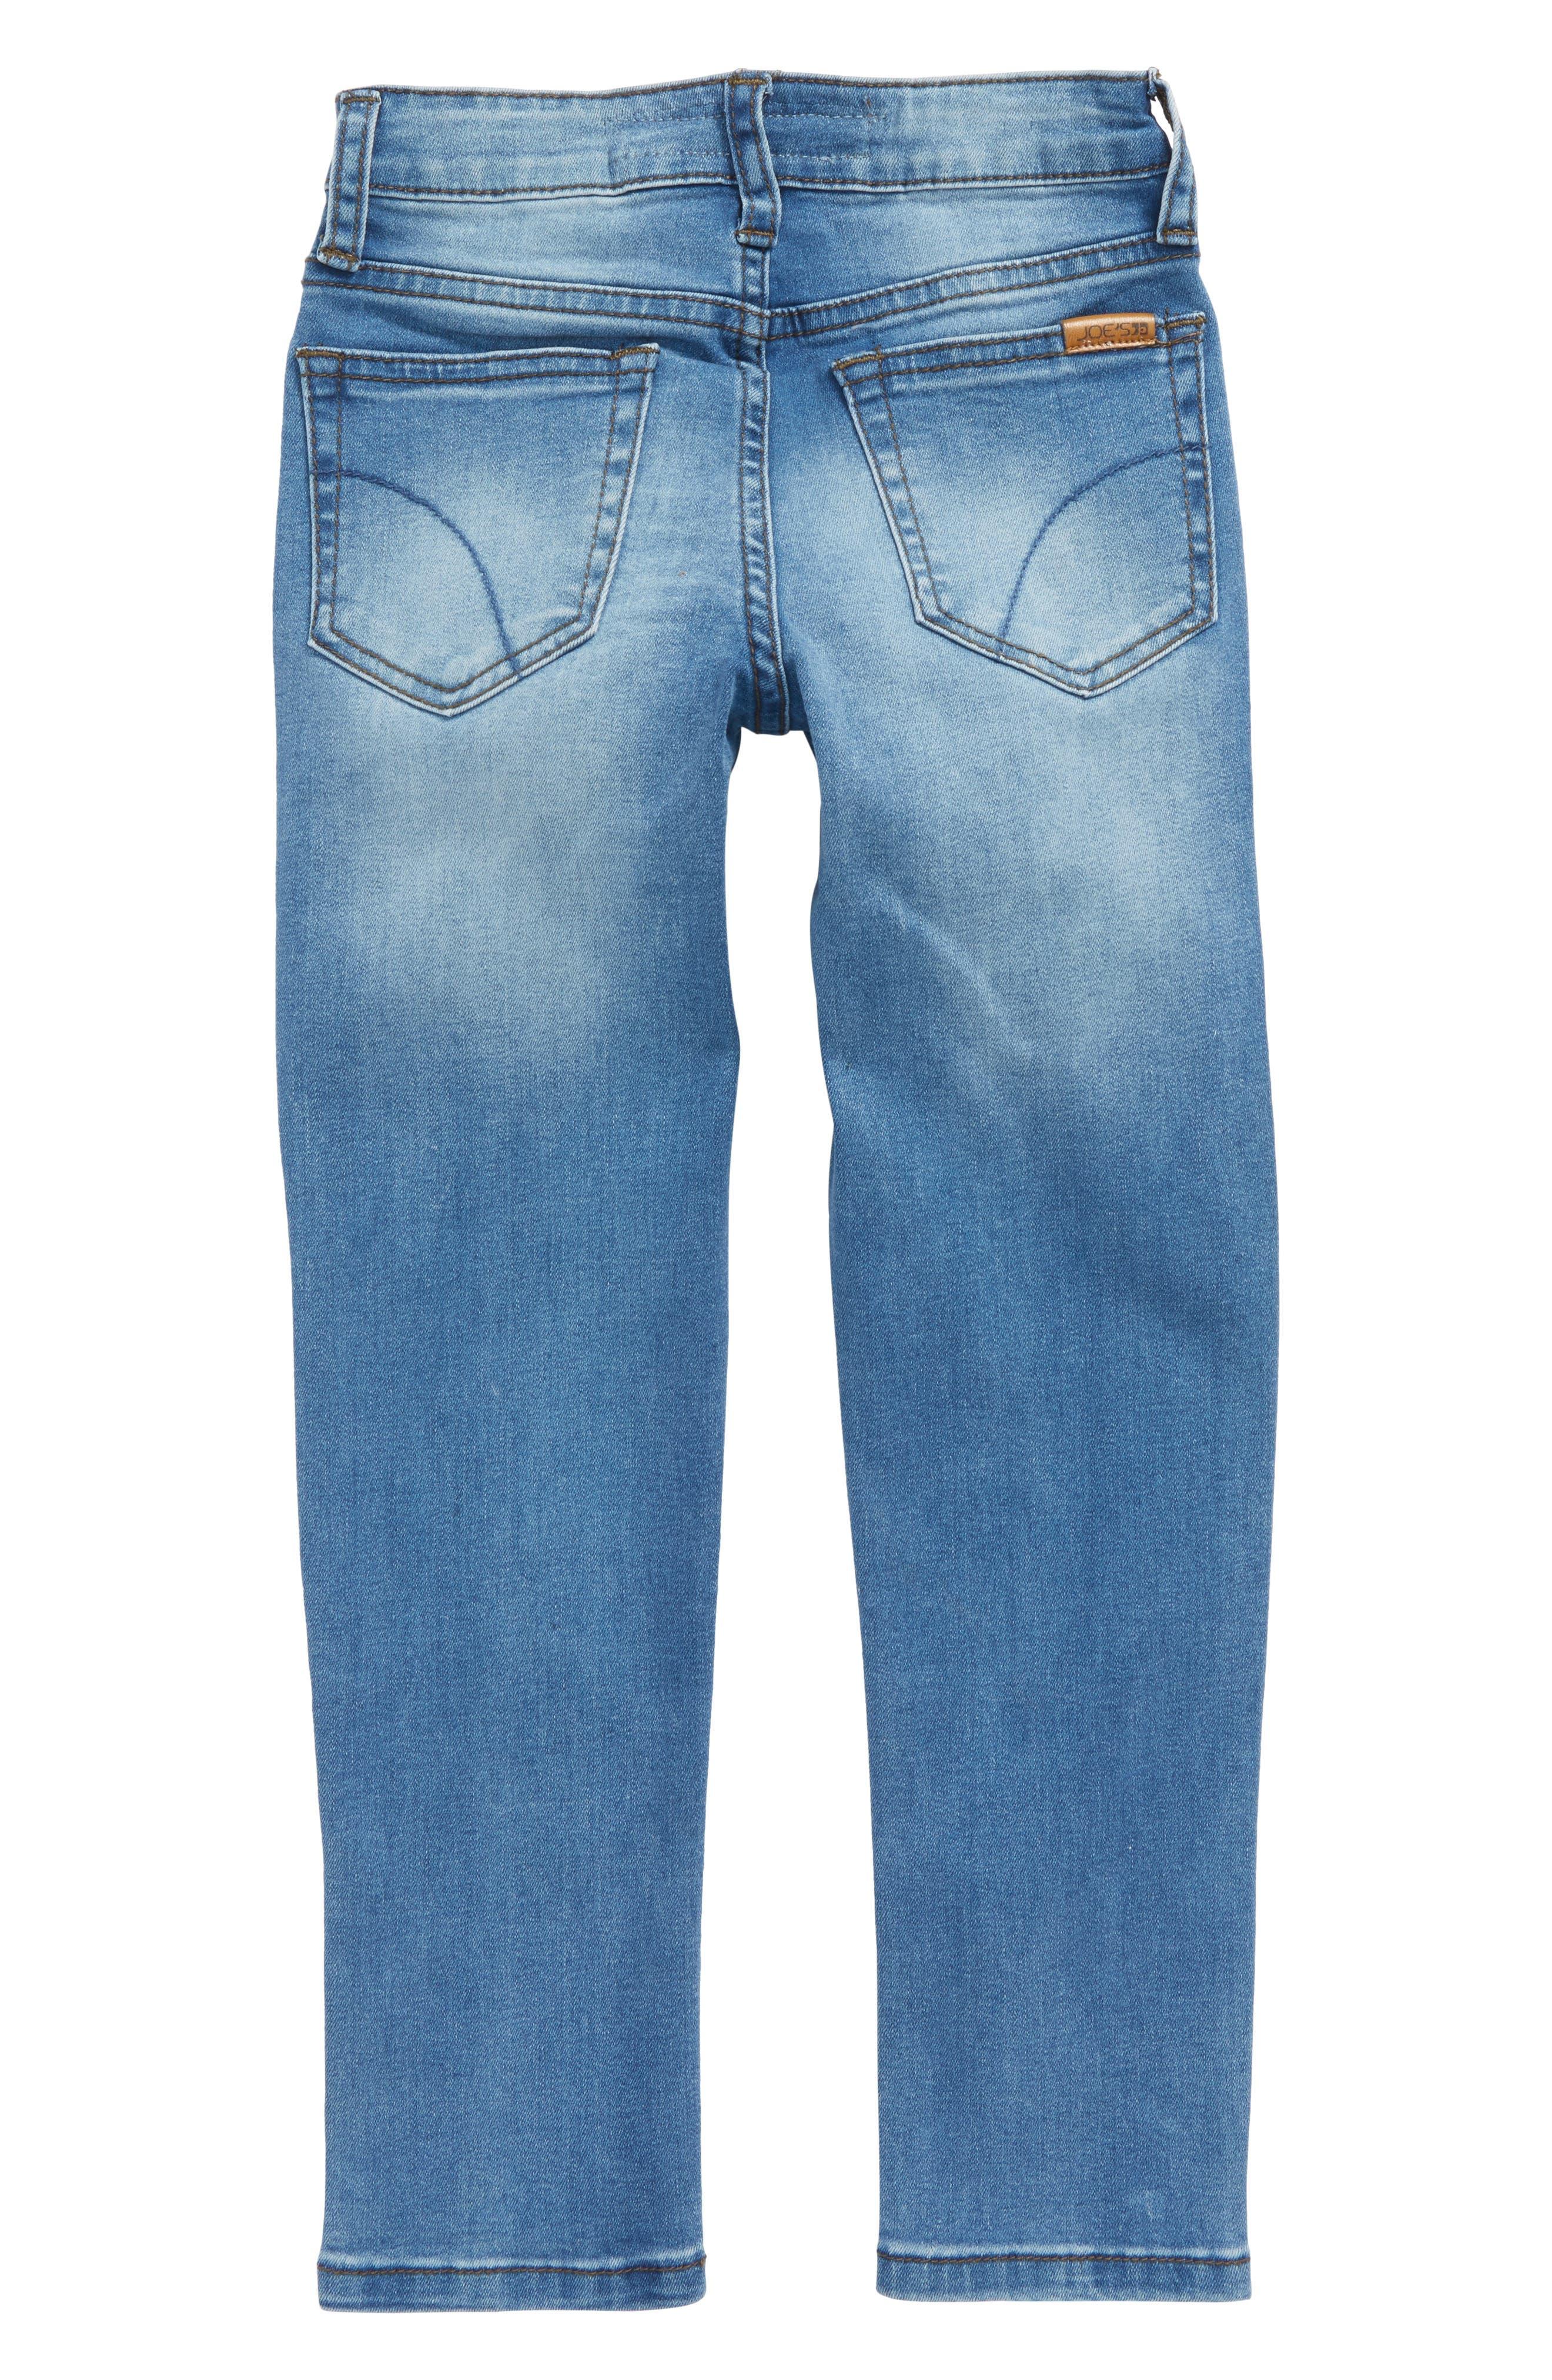 Rad Slim Fit Stretch Jeans,                             Alternate thumbnail 2, color,                             463